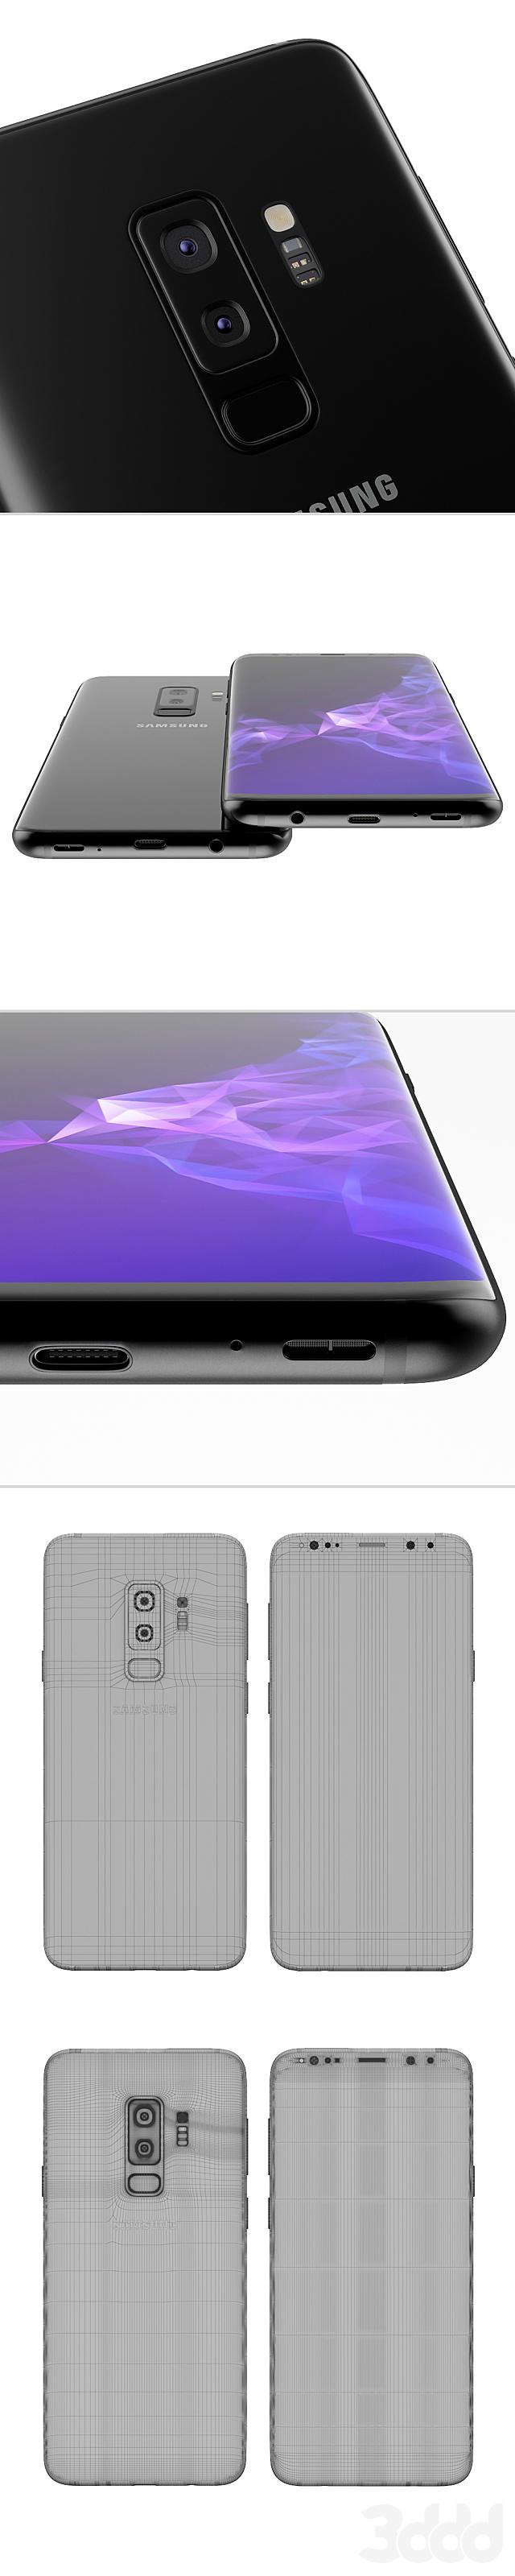 Samsung Galaxy S9 PLUS Black